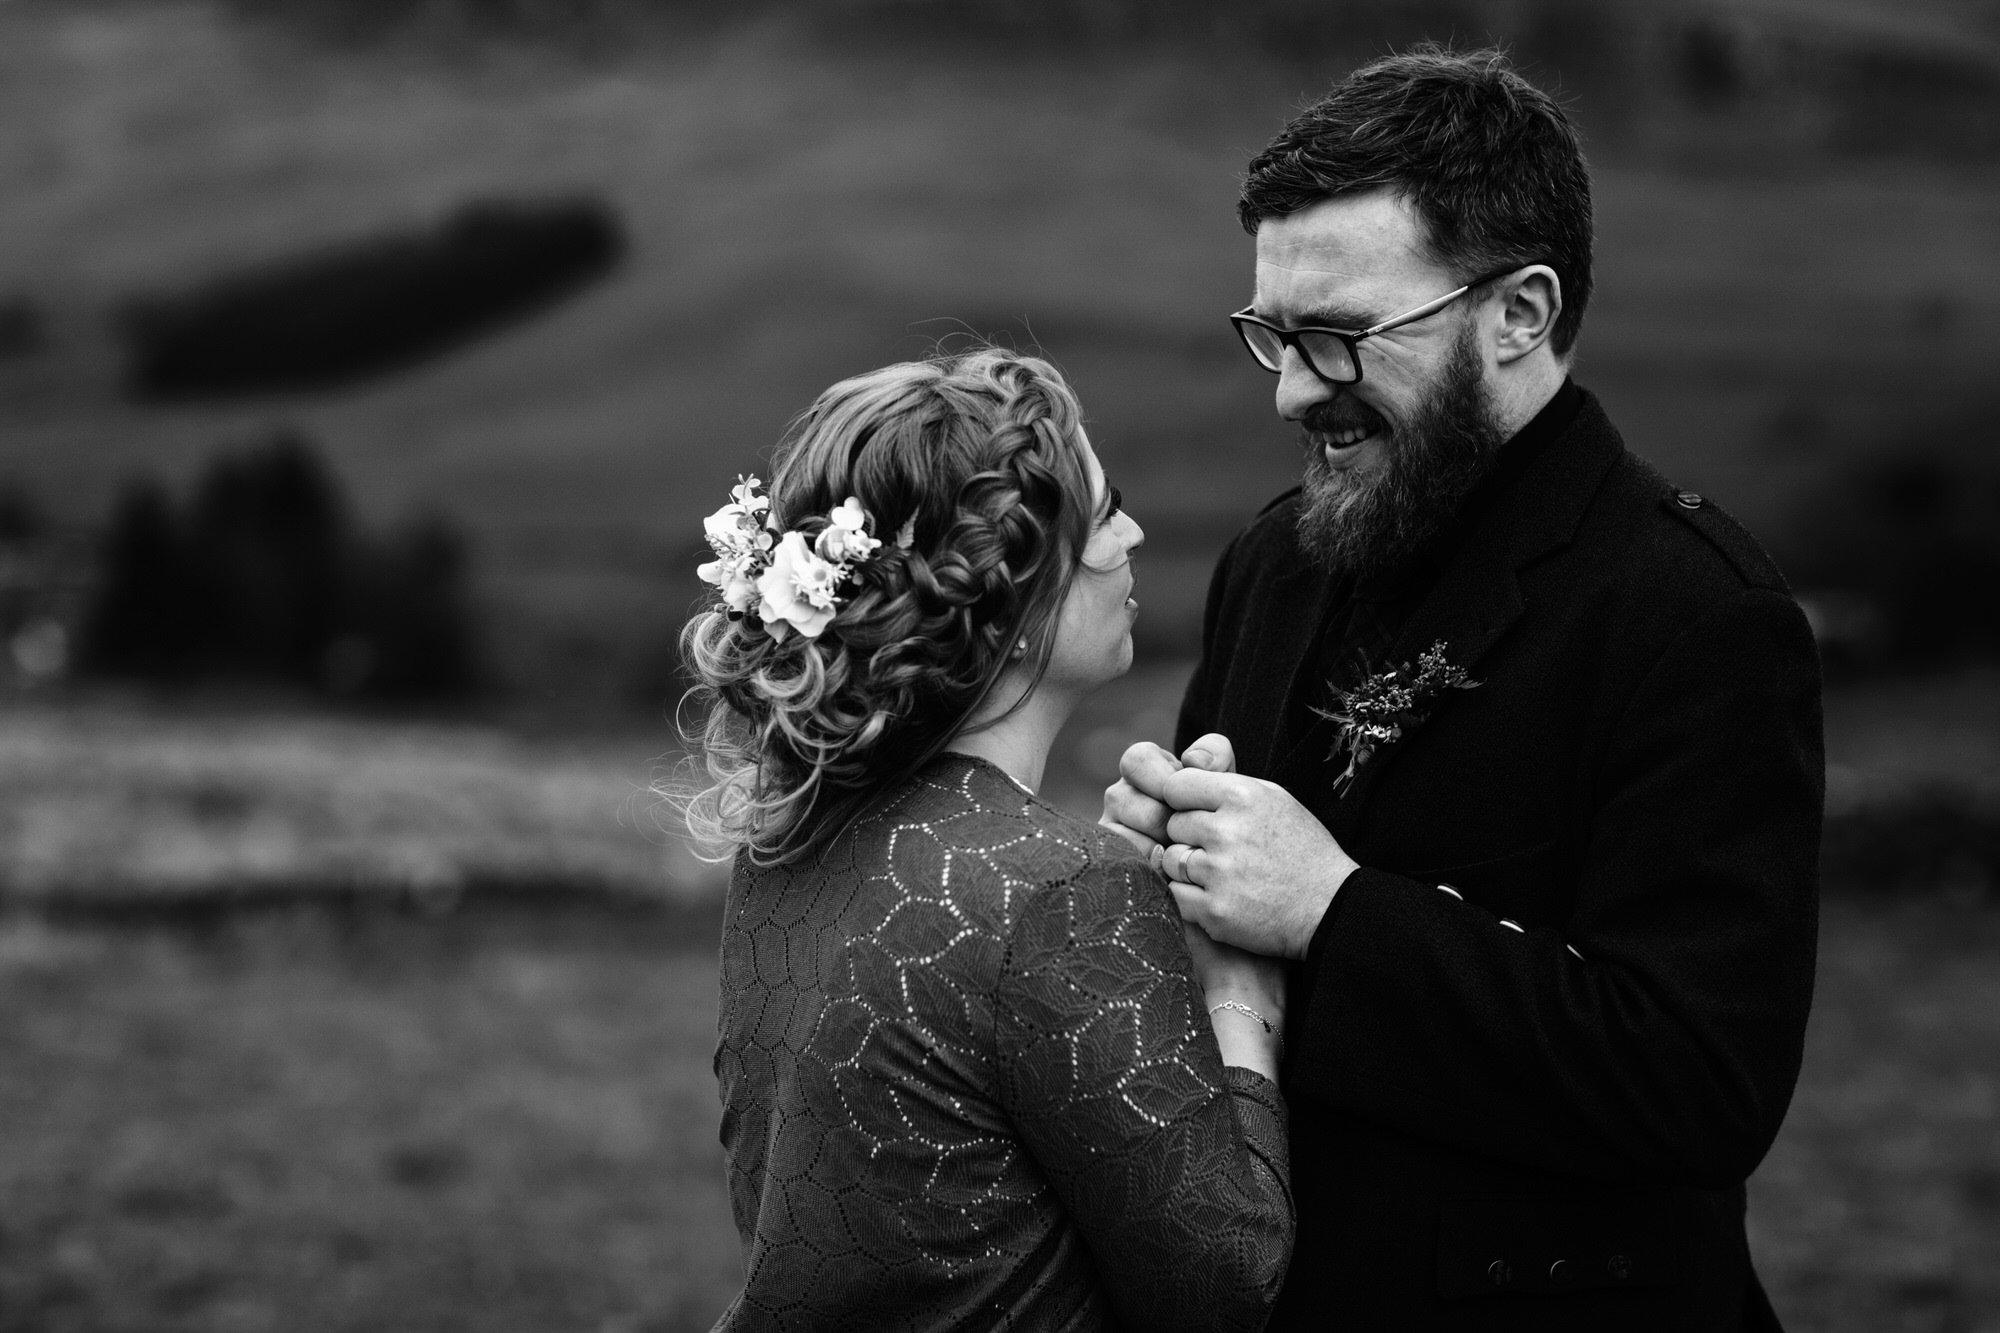 039 TIN SHED KNOCKRAICH WEDDING AUSTRIAN SCOTTISH ZOE ALEXANDRA PHOTOGRAPHY